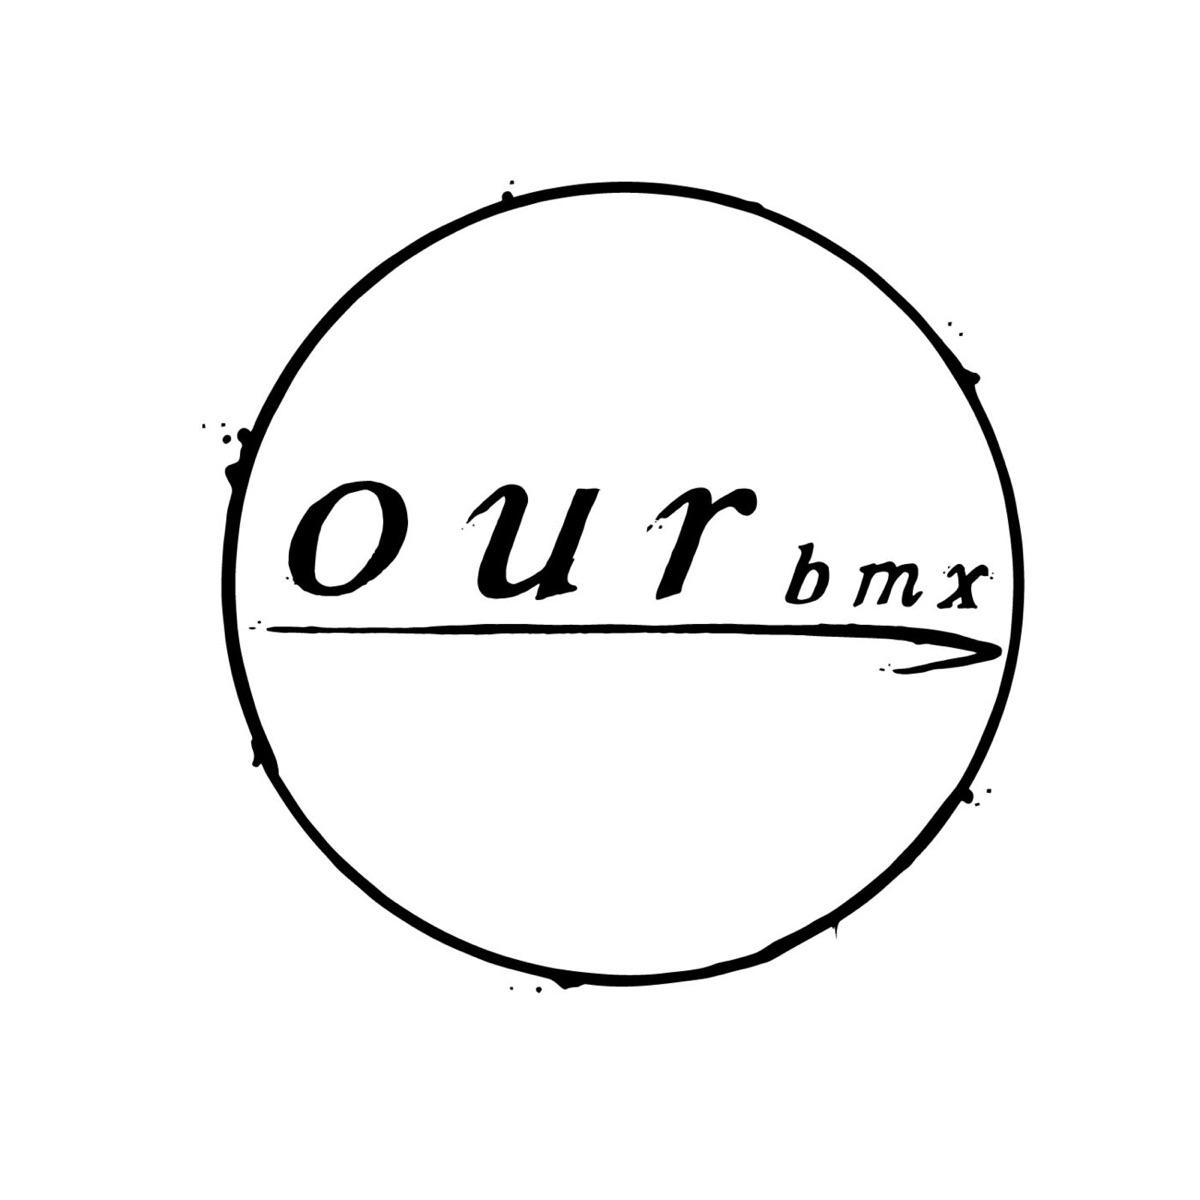 Our BMX - Feeble Talk